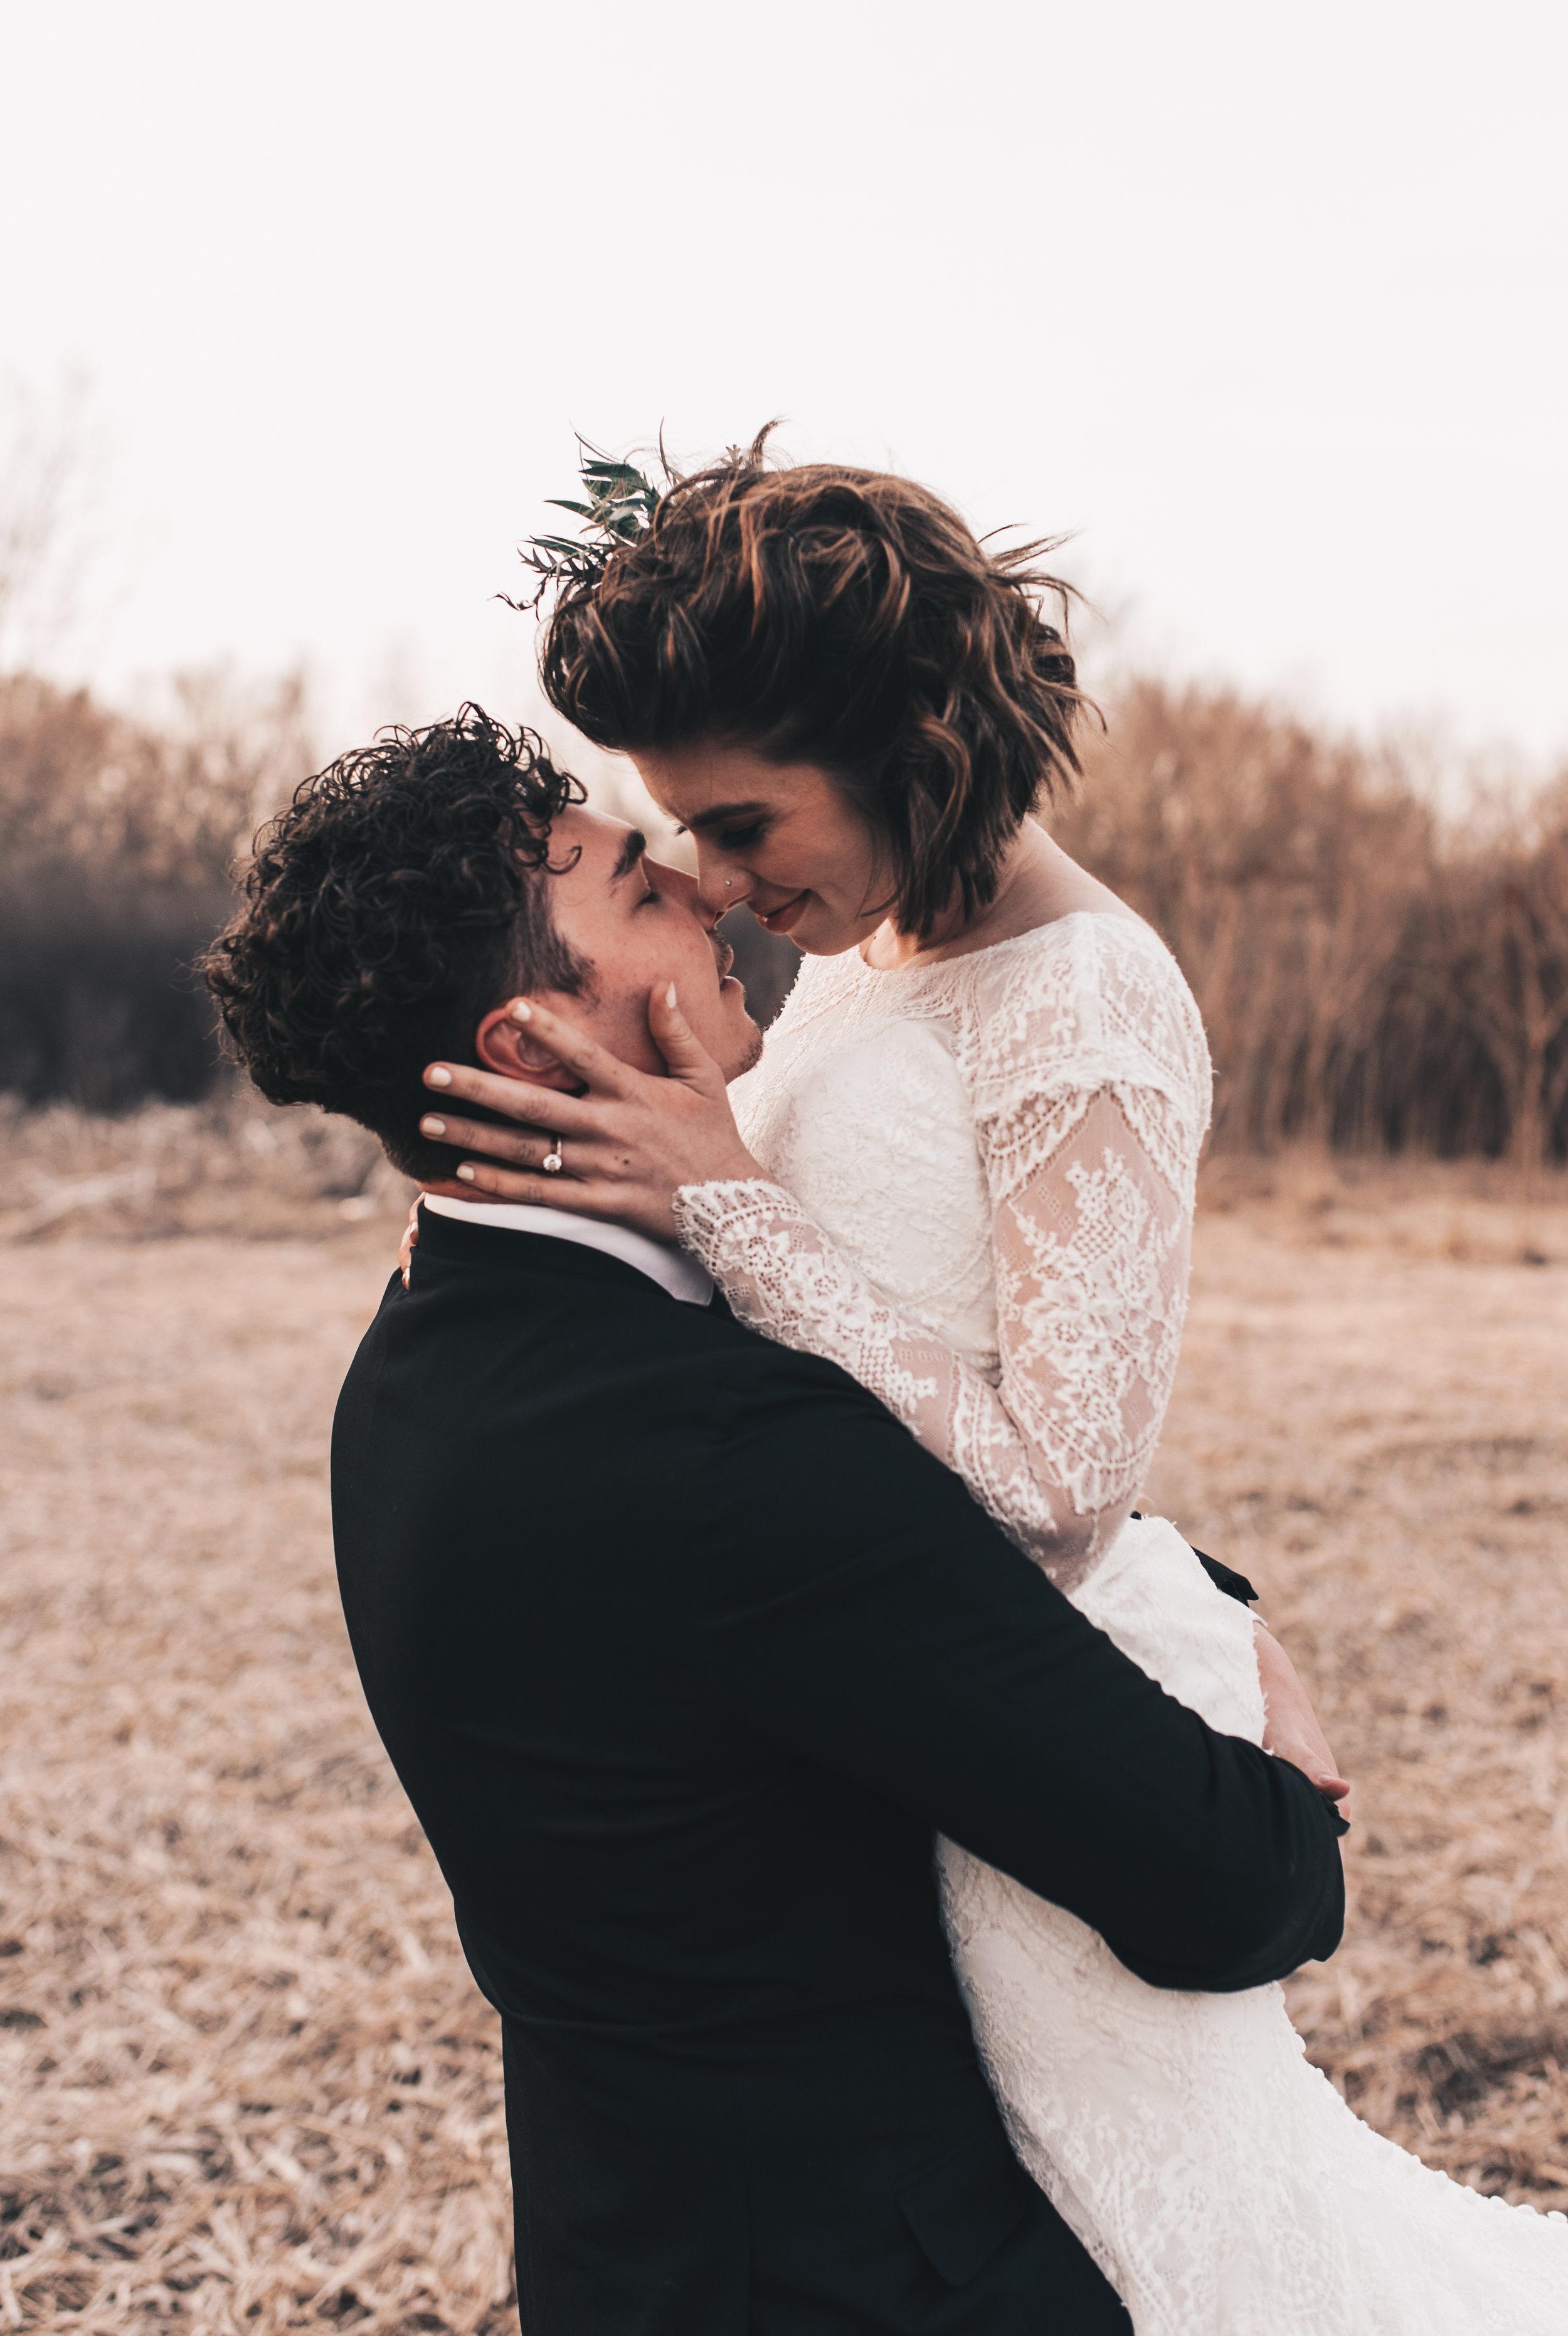 Wedding photography, elopement, adventurous elopement, boho bride, outdoor vow renewal, boho elopement picnic, outdoor wedding, midwest elopement, elopement pictures